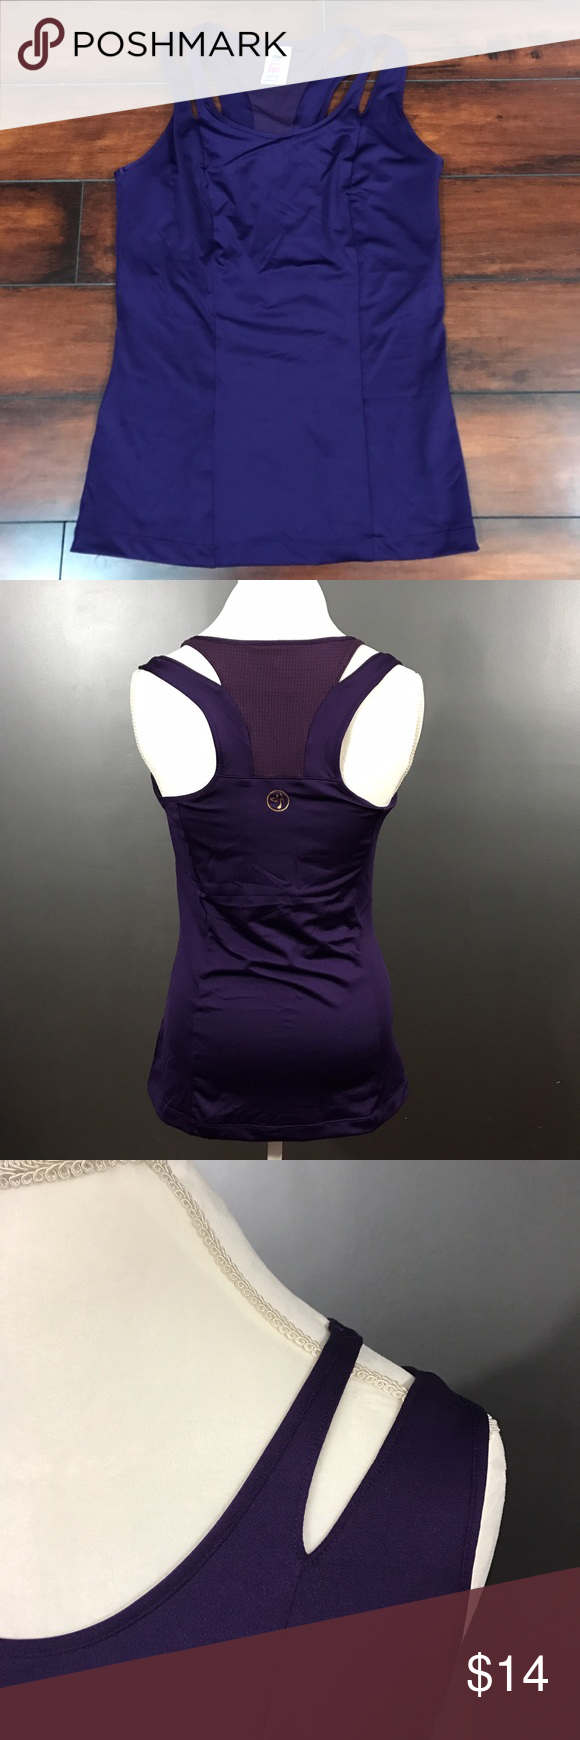 ZUMBA Wear Large Purple Active Tank Women's size large purple Zumba Wear workout tank with built in bra. 92% Polyester, 8% spandex. Great condition. Zumba Wear Tops Tank Tops